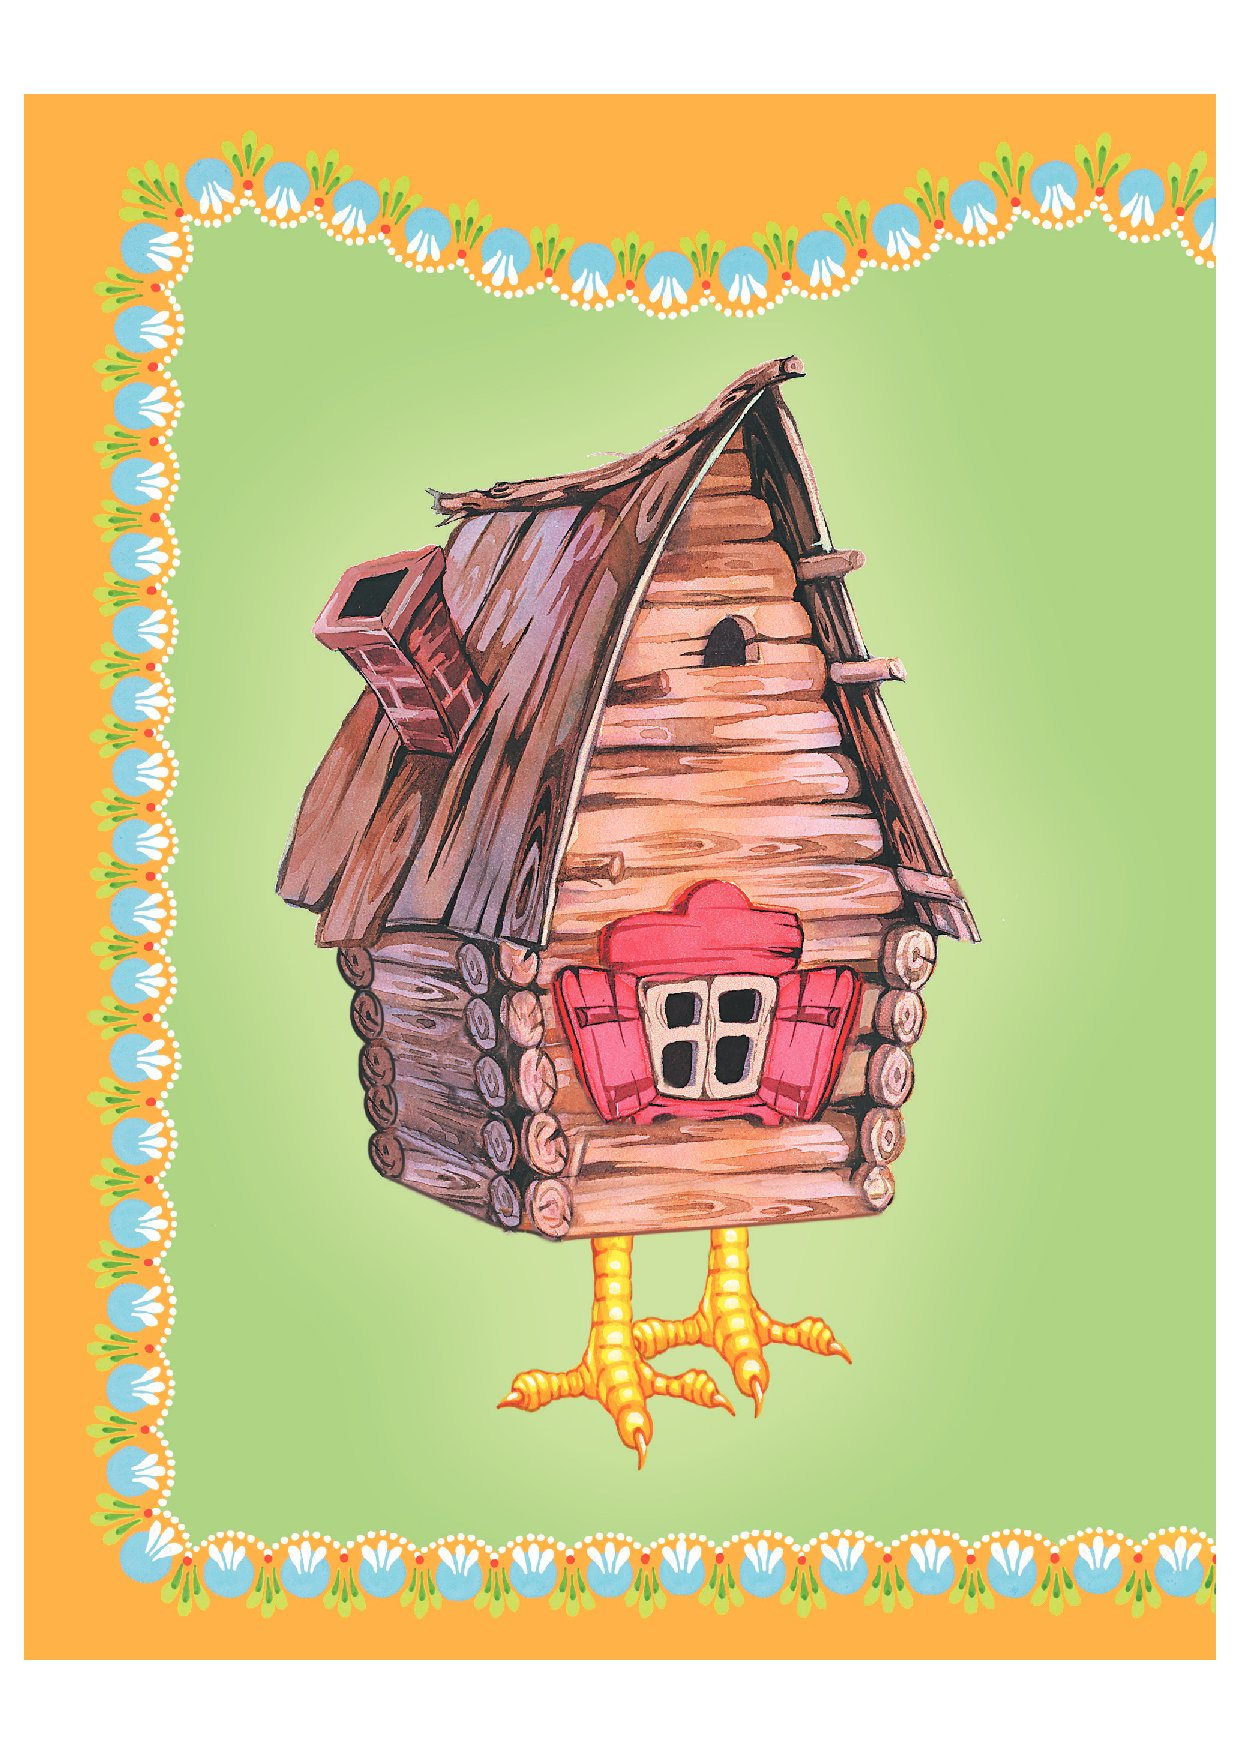 Картинки баба яга и избушка на курьих ножках рисунки, где весна открытки